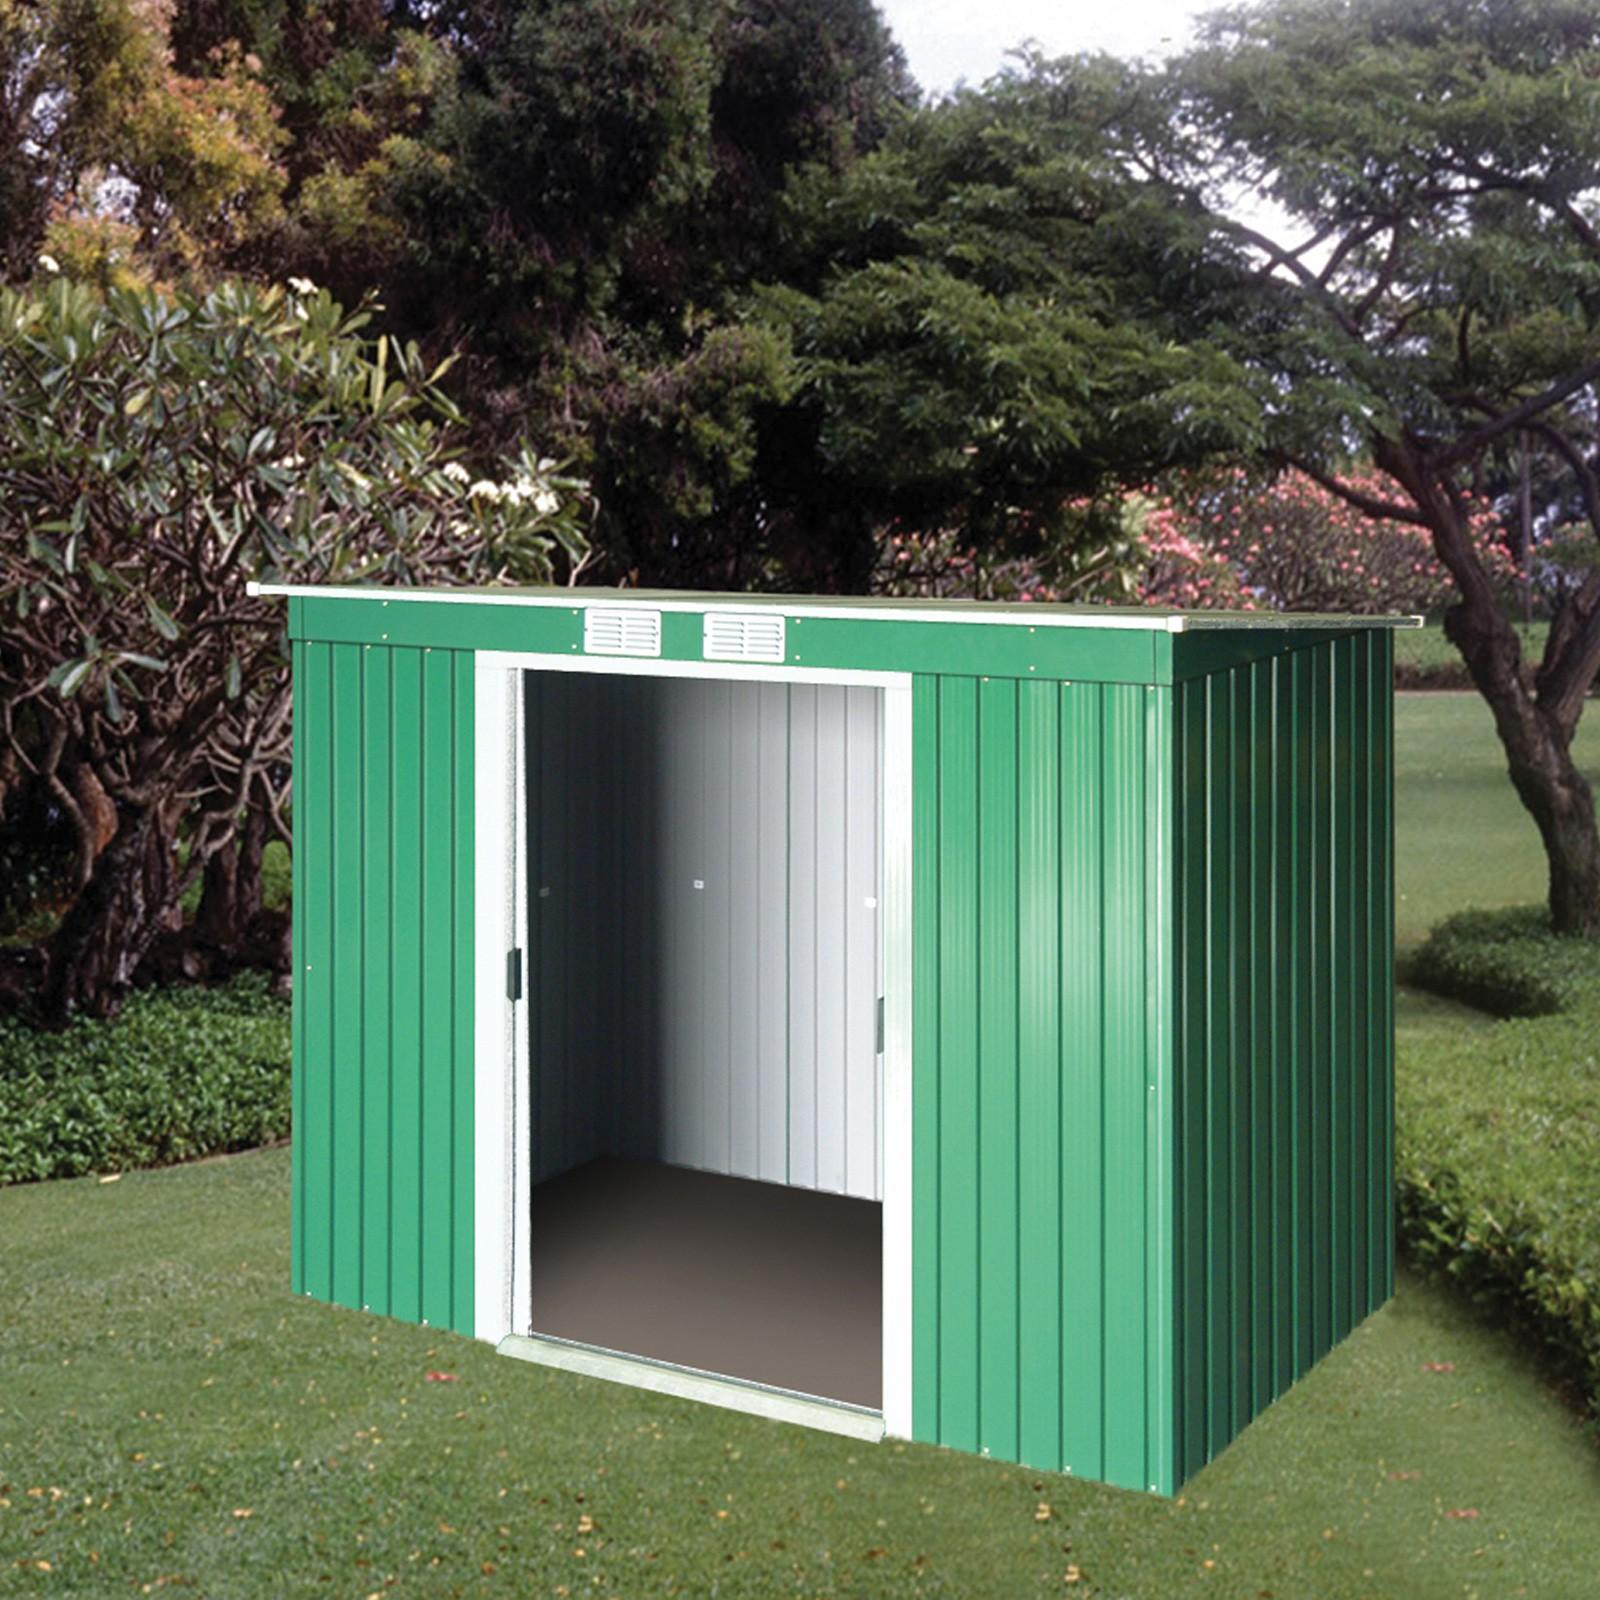 tepro metall ger tehaus gartenhaus pent roof 8 x 4 gr n. Black Bedroom Furniture Sets. Home Design Ideas